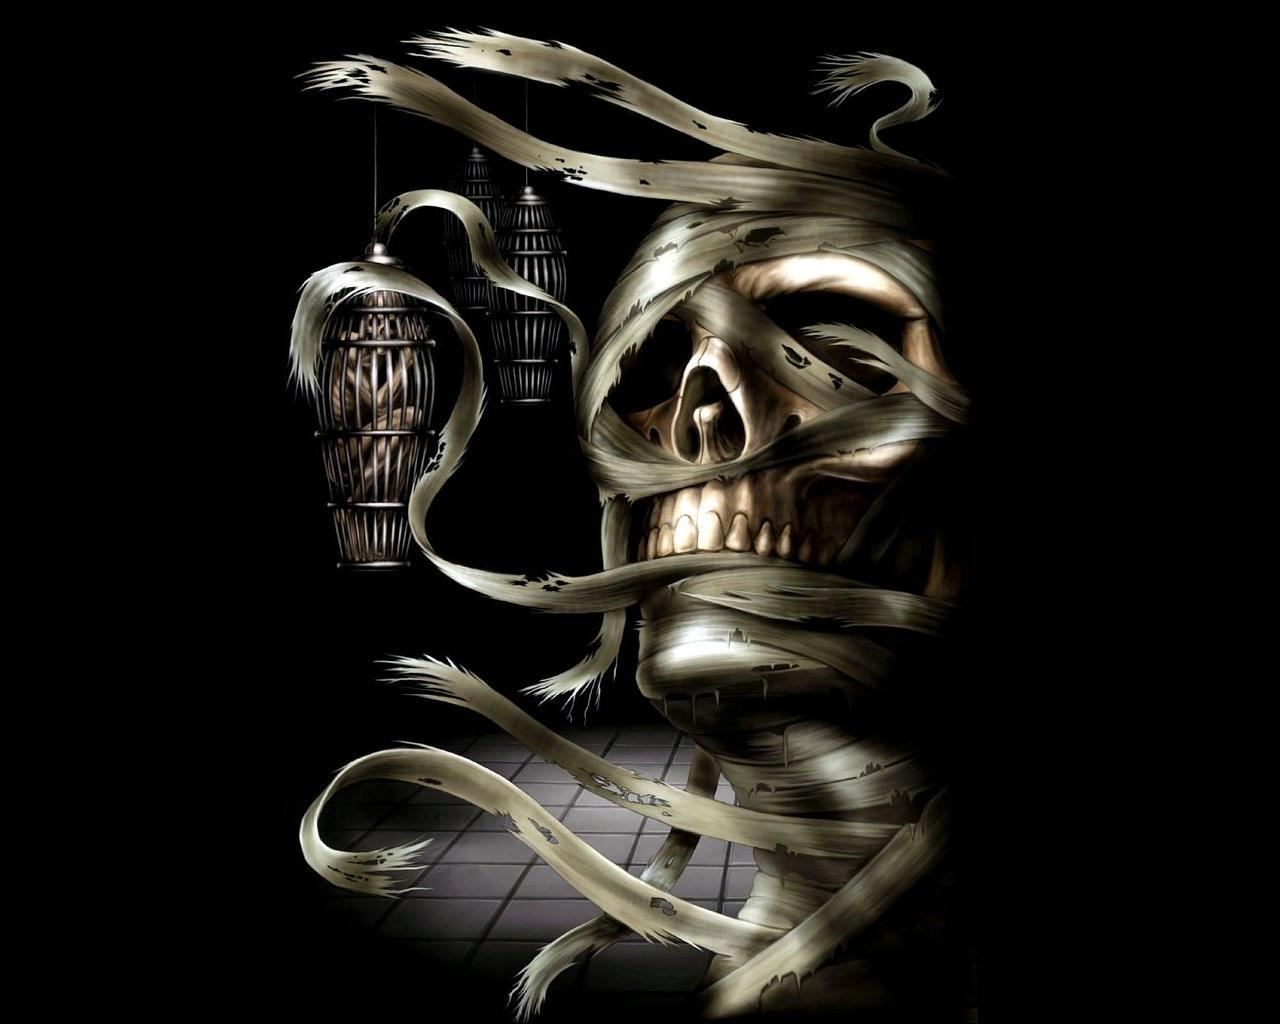 http://2.bp.blogspot.com/-bAF33F470Qc/TqPPxoFmljI/AAAAAAAACo8/-H_nCxHGIxM/s1600/Skull+_wallpapers_Mummy+Skull.jpg